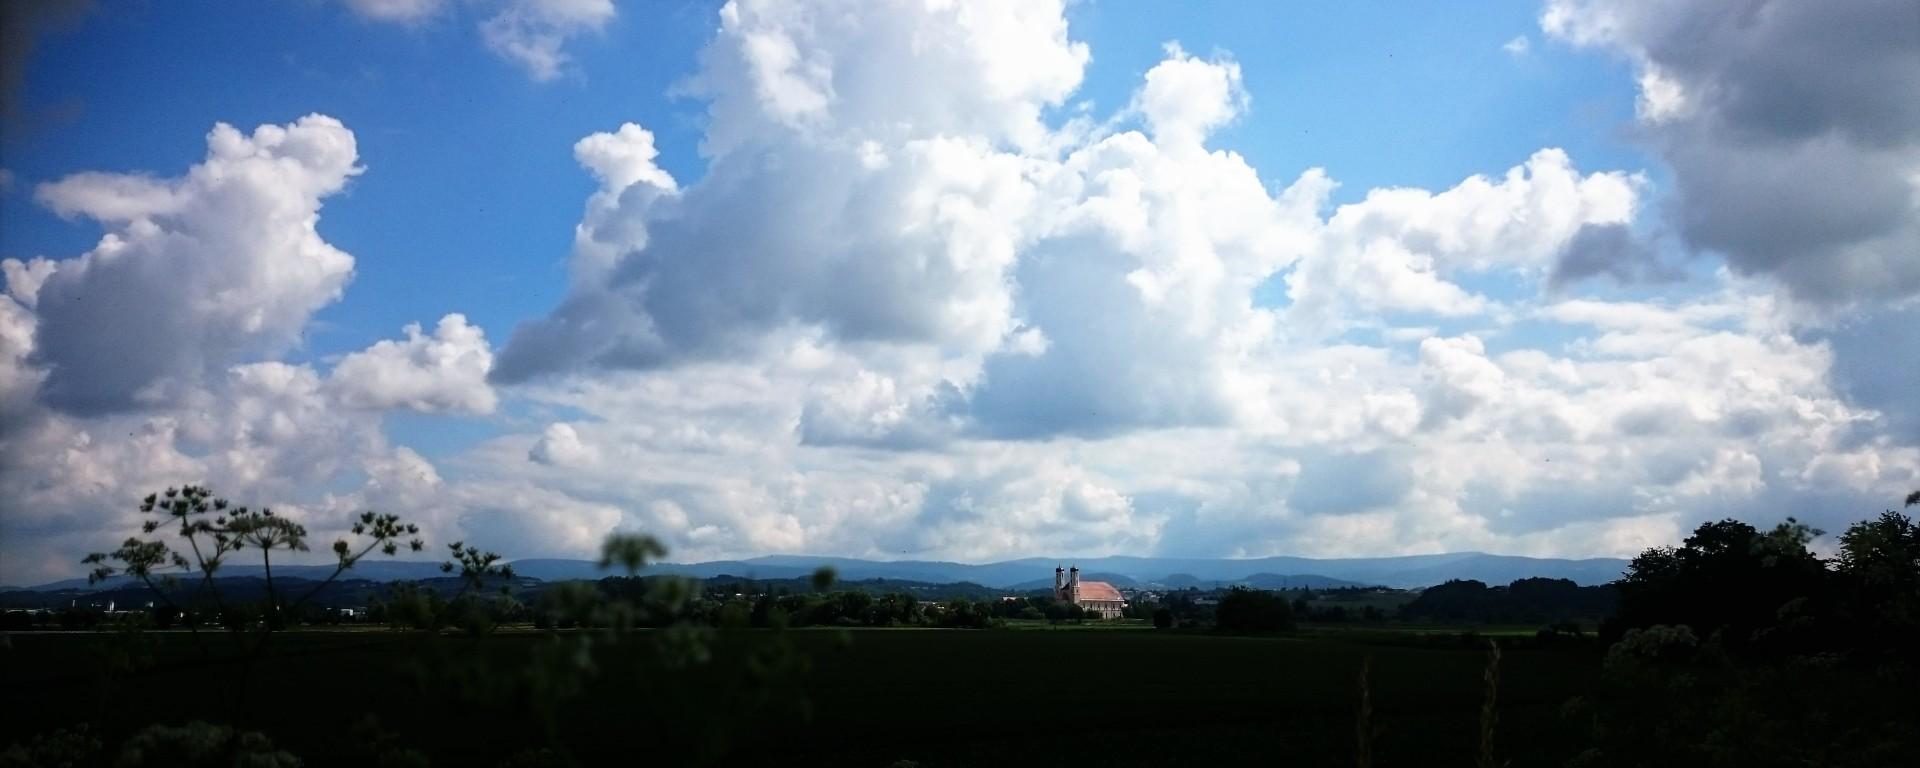 Donau near Regensburg